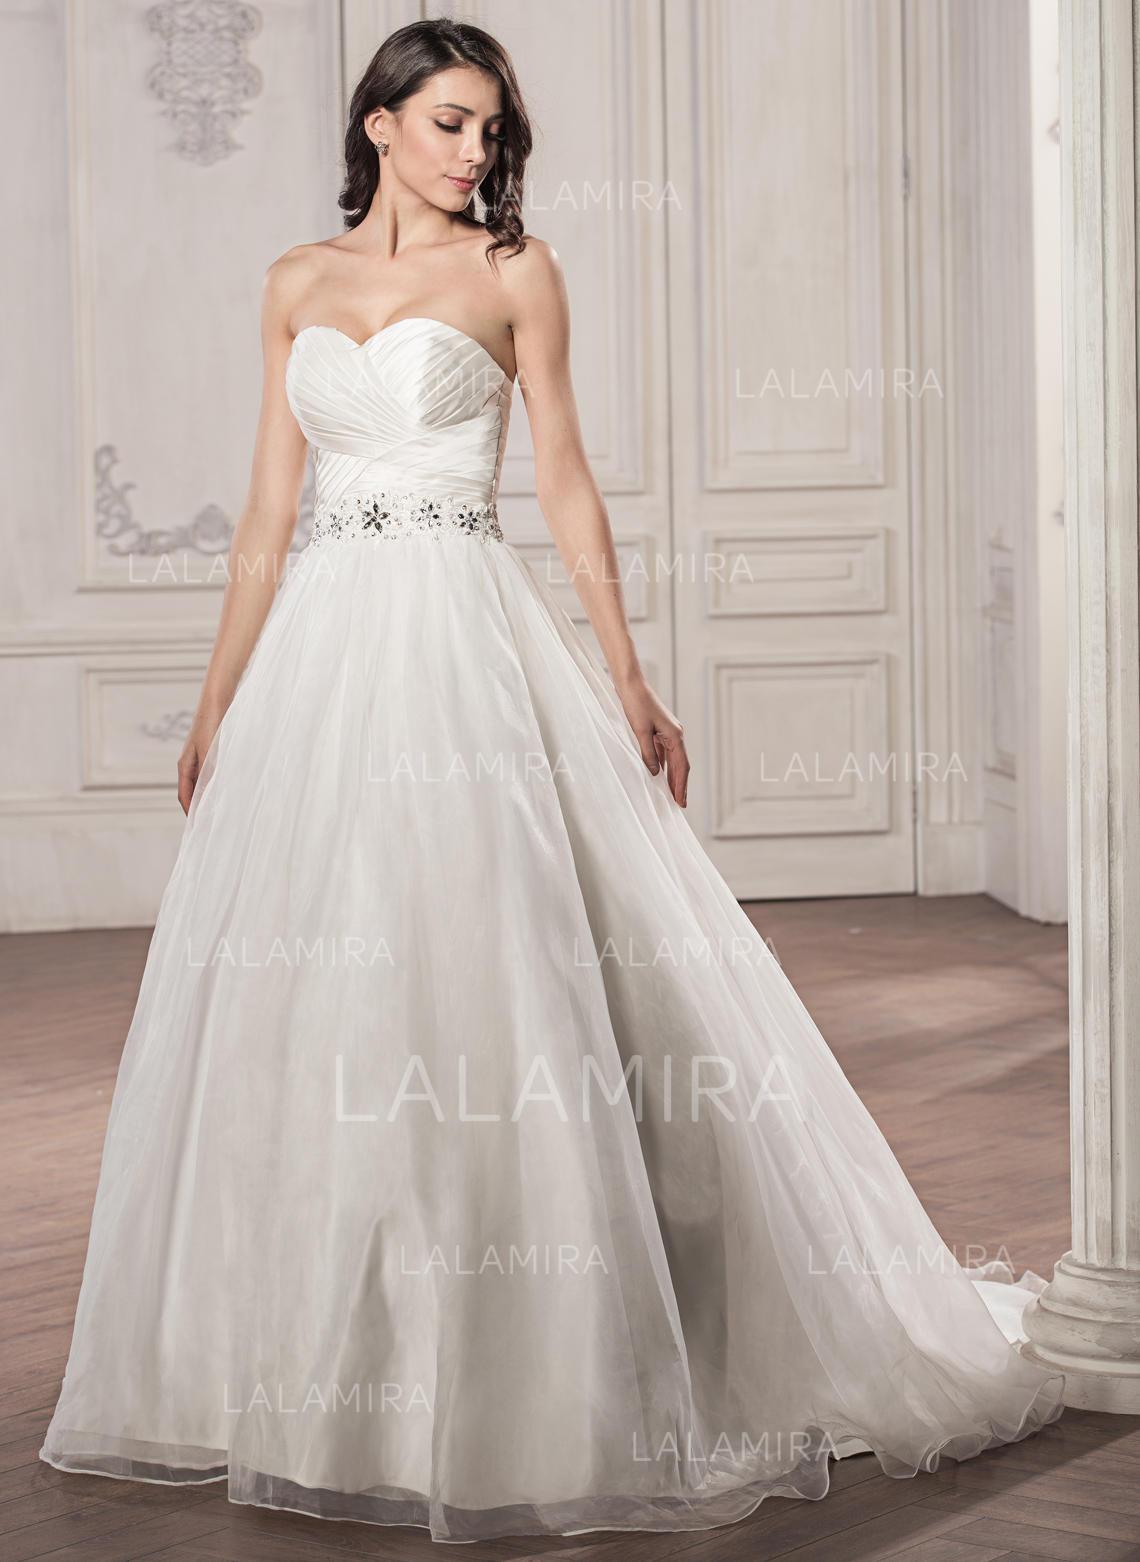 Sweetheart Ball-Gown Wedding Dresses Satin Organza Ruffle Beading Sequins  Sleeveless Court Train (002059190. Loading zoom 063d303c1